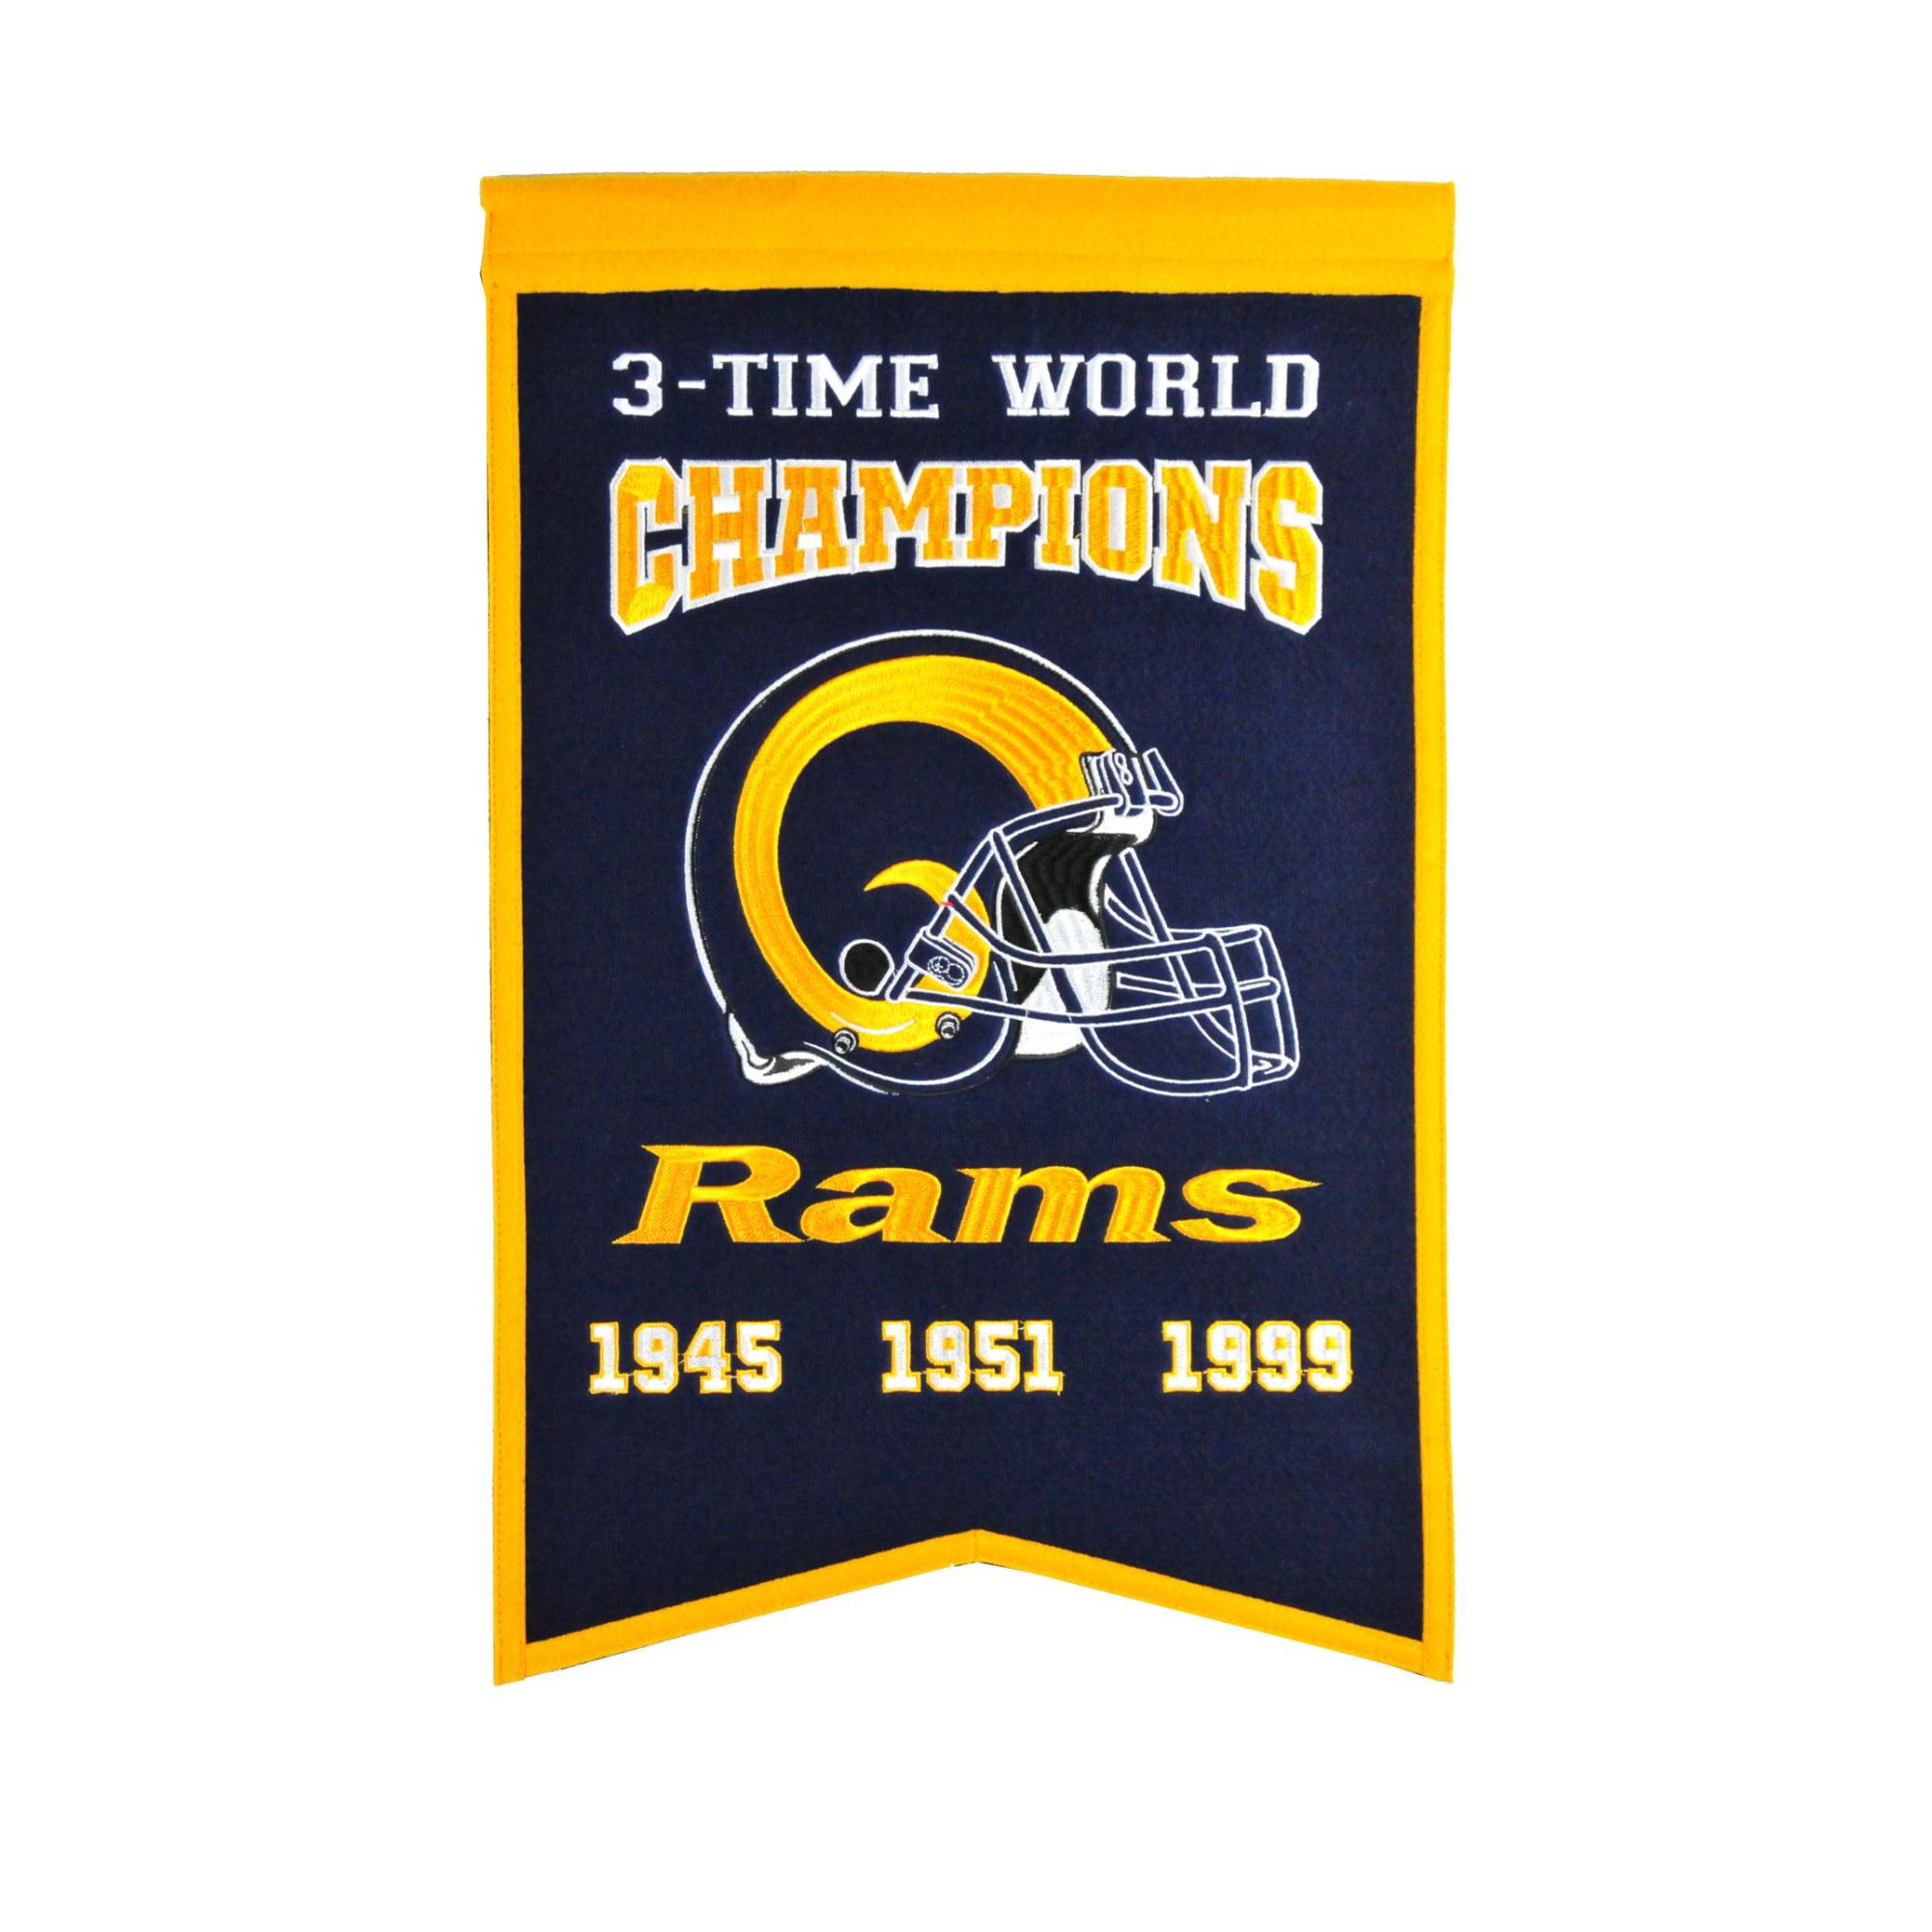 Winning Streak - NFL Champions Super Bowl Banner, Los Angeles Rams